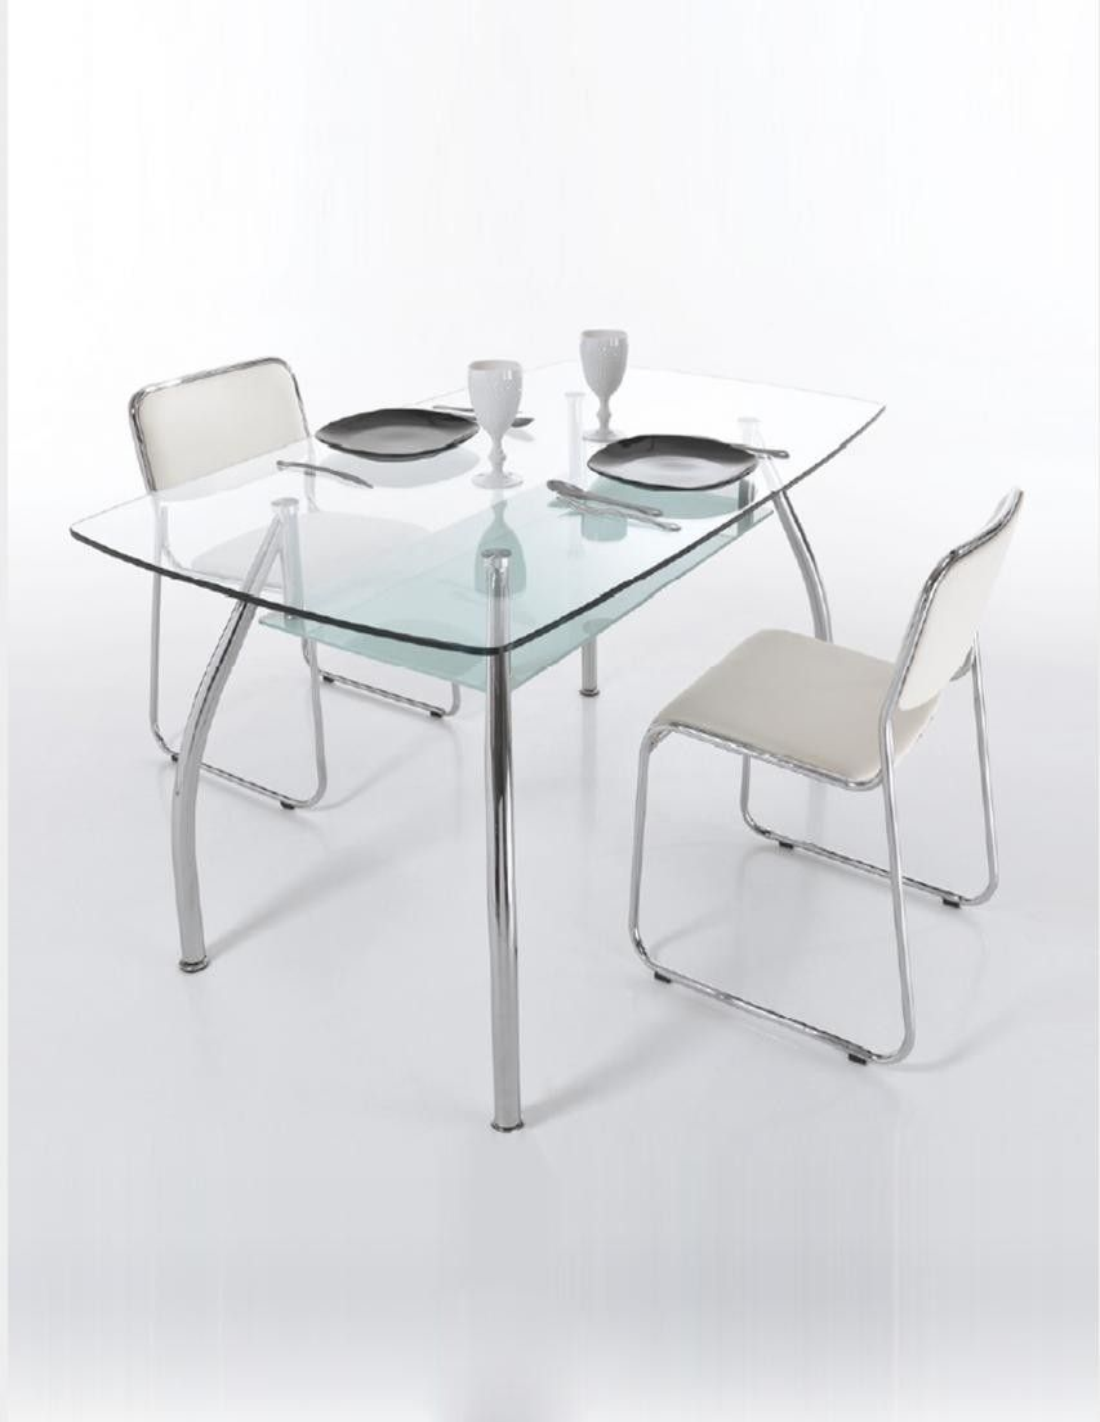 Sedia operativa da ufficio in ecopelle bianca o nera rupert for Sedia design ecopelle bianca